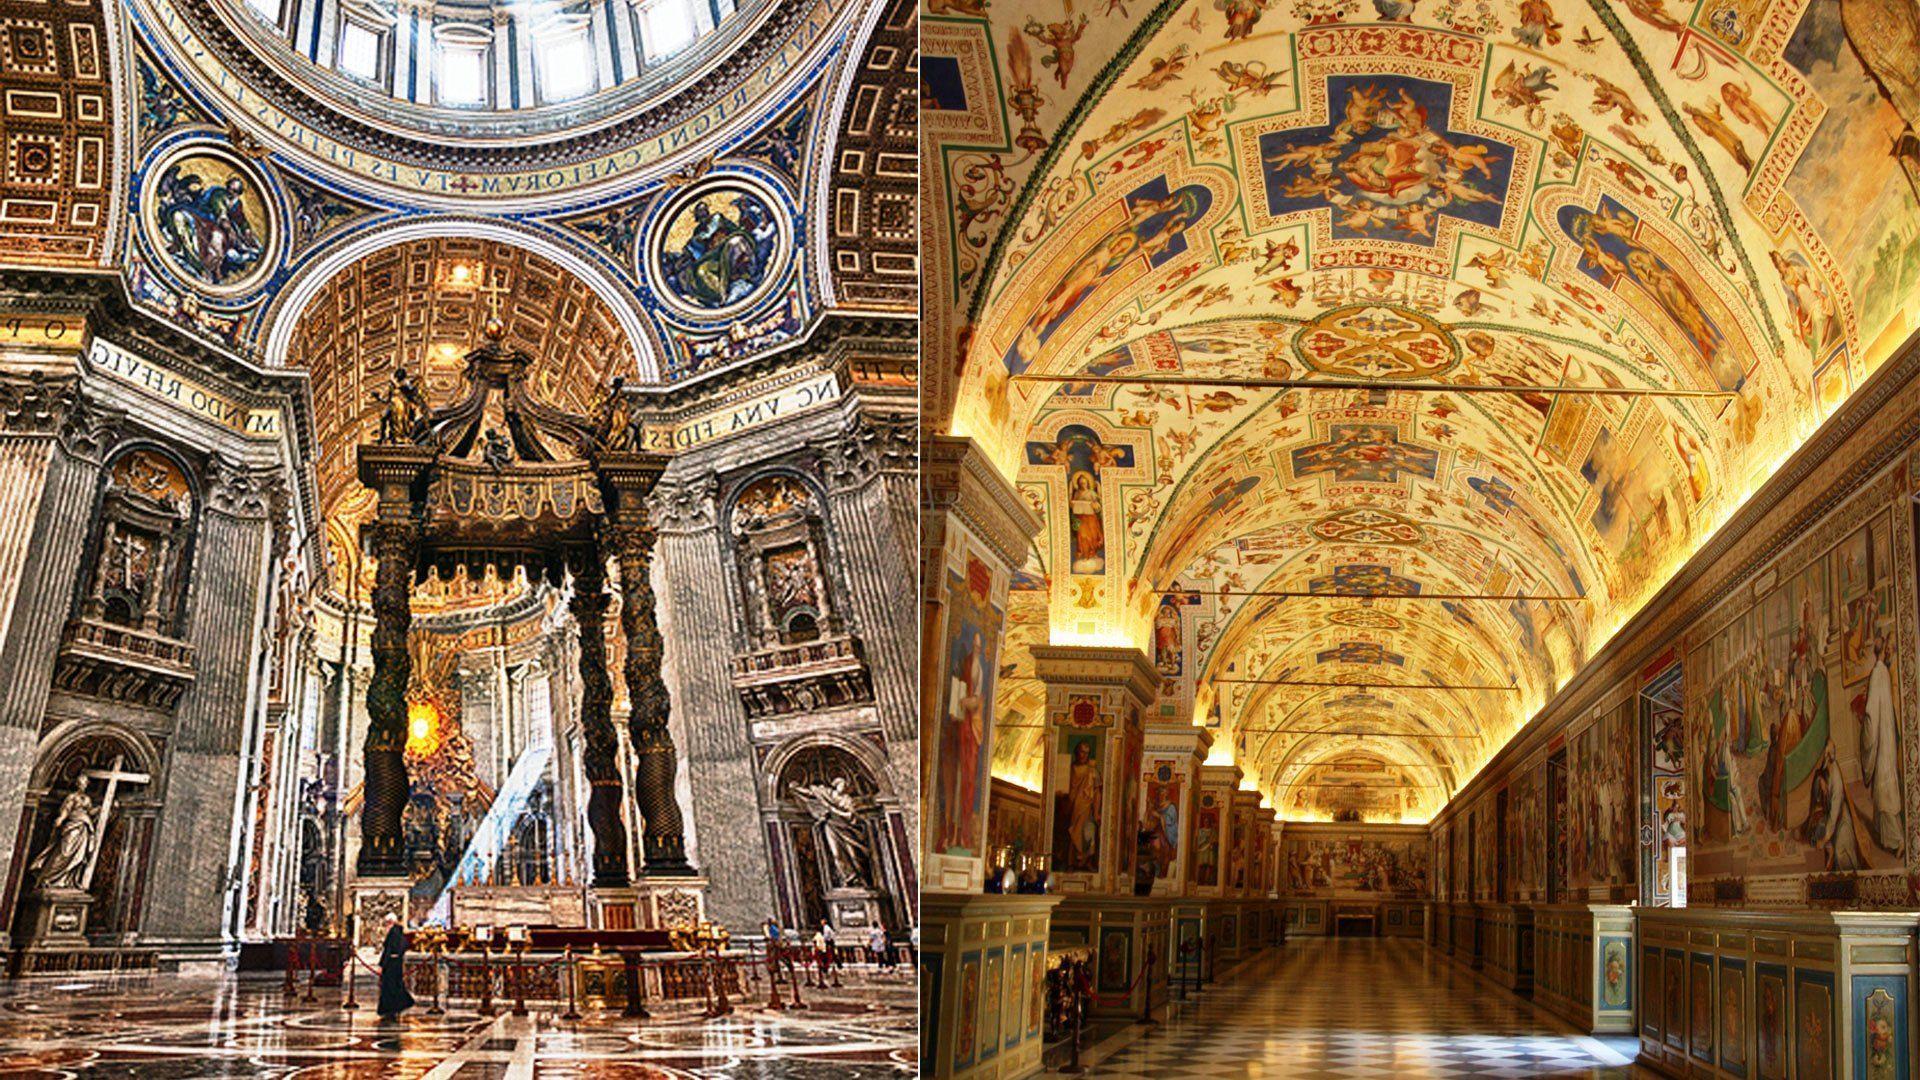 vatican wallpapers travel world - photo #21